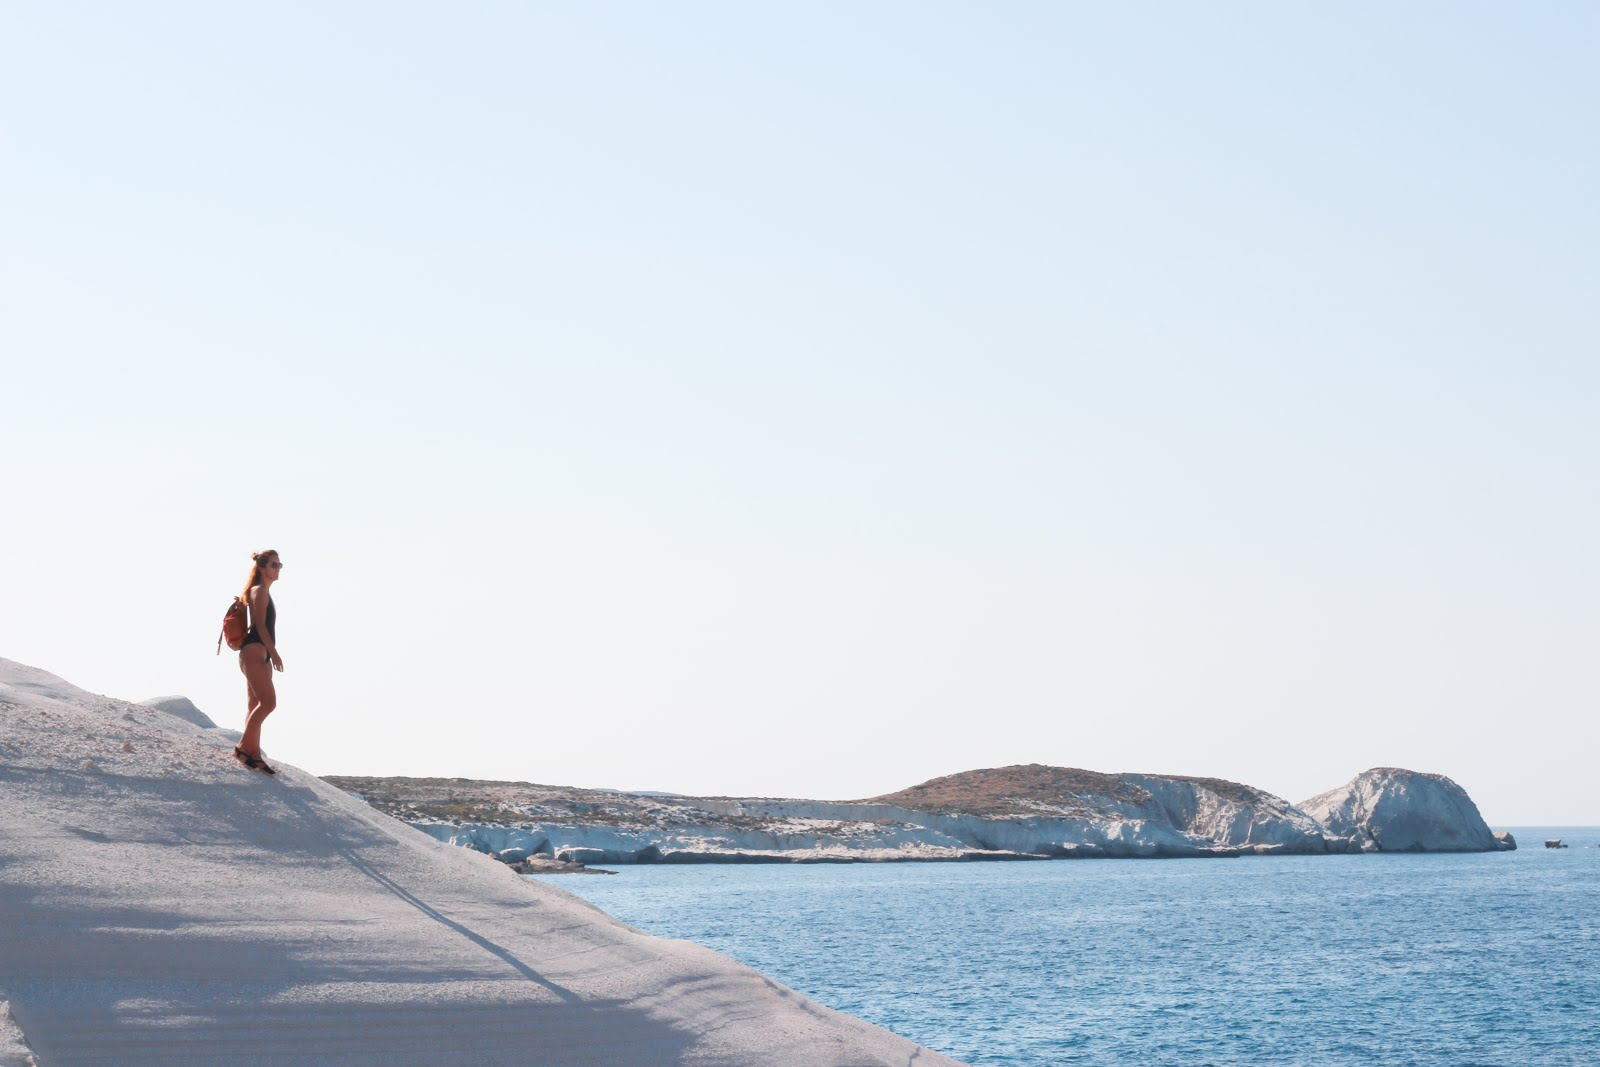 Sarakiniko Beach Cliffs in Milos island, Greece